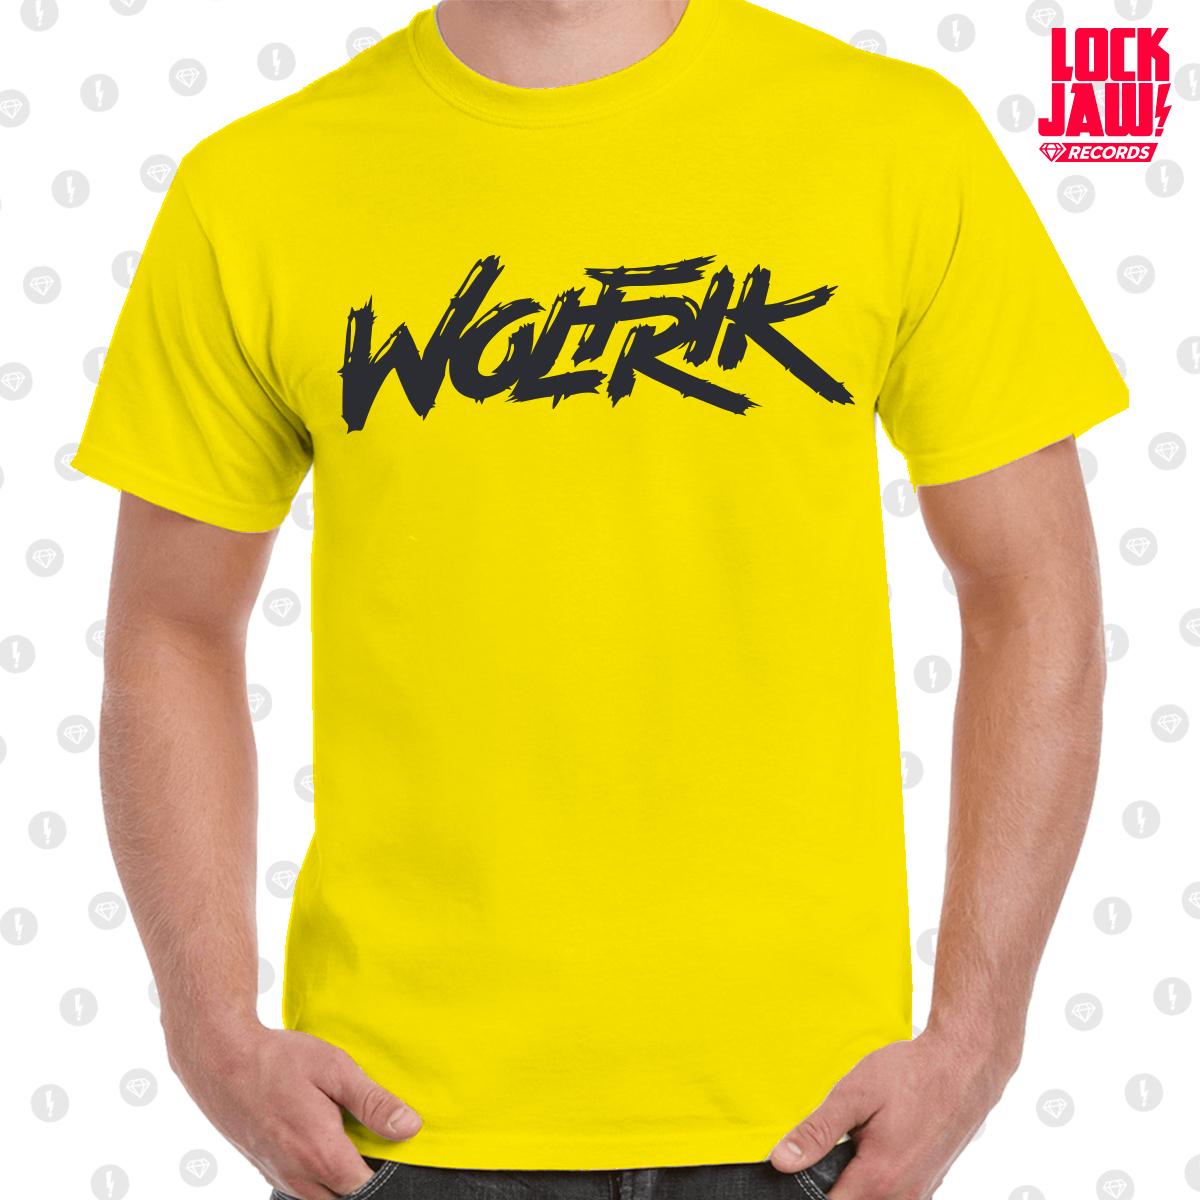 b635c57b Wolfrik - Logo T-Shirt - Yellow With Black Print - Lockjaw Records